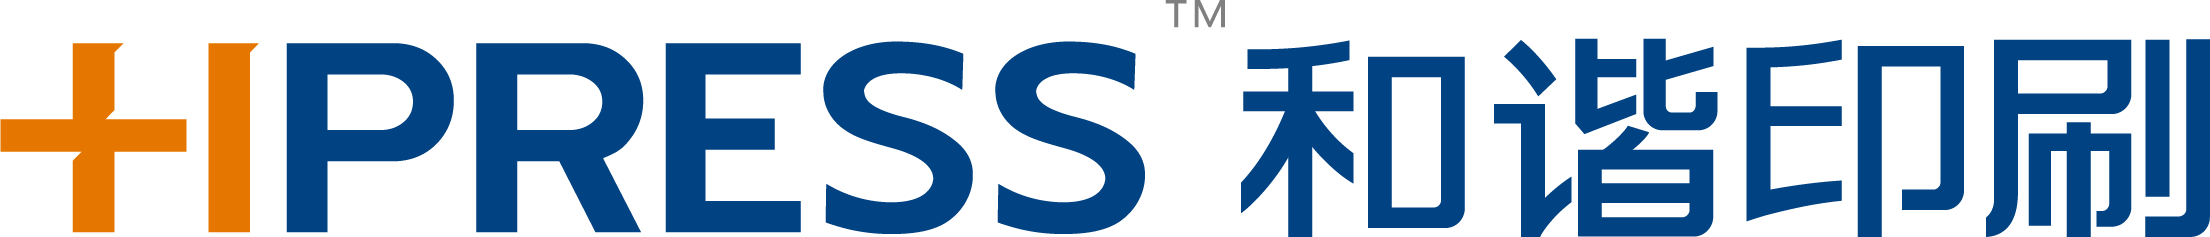 hpress logo-01.png